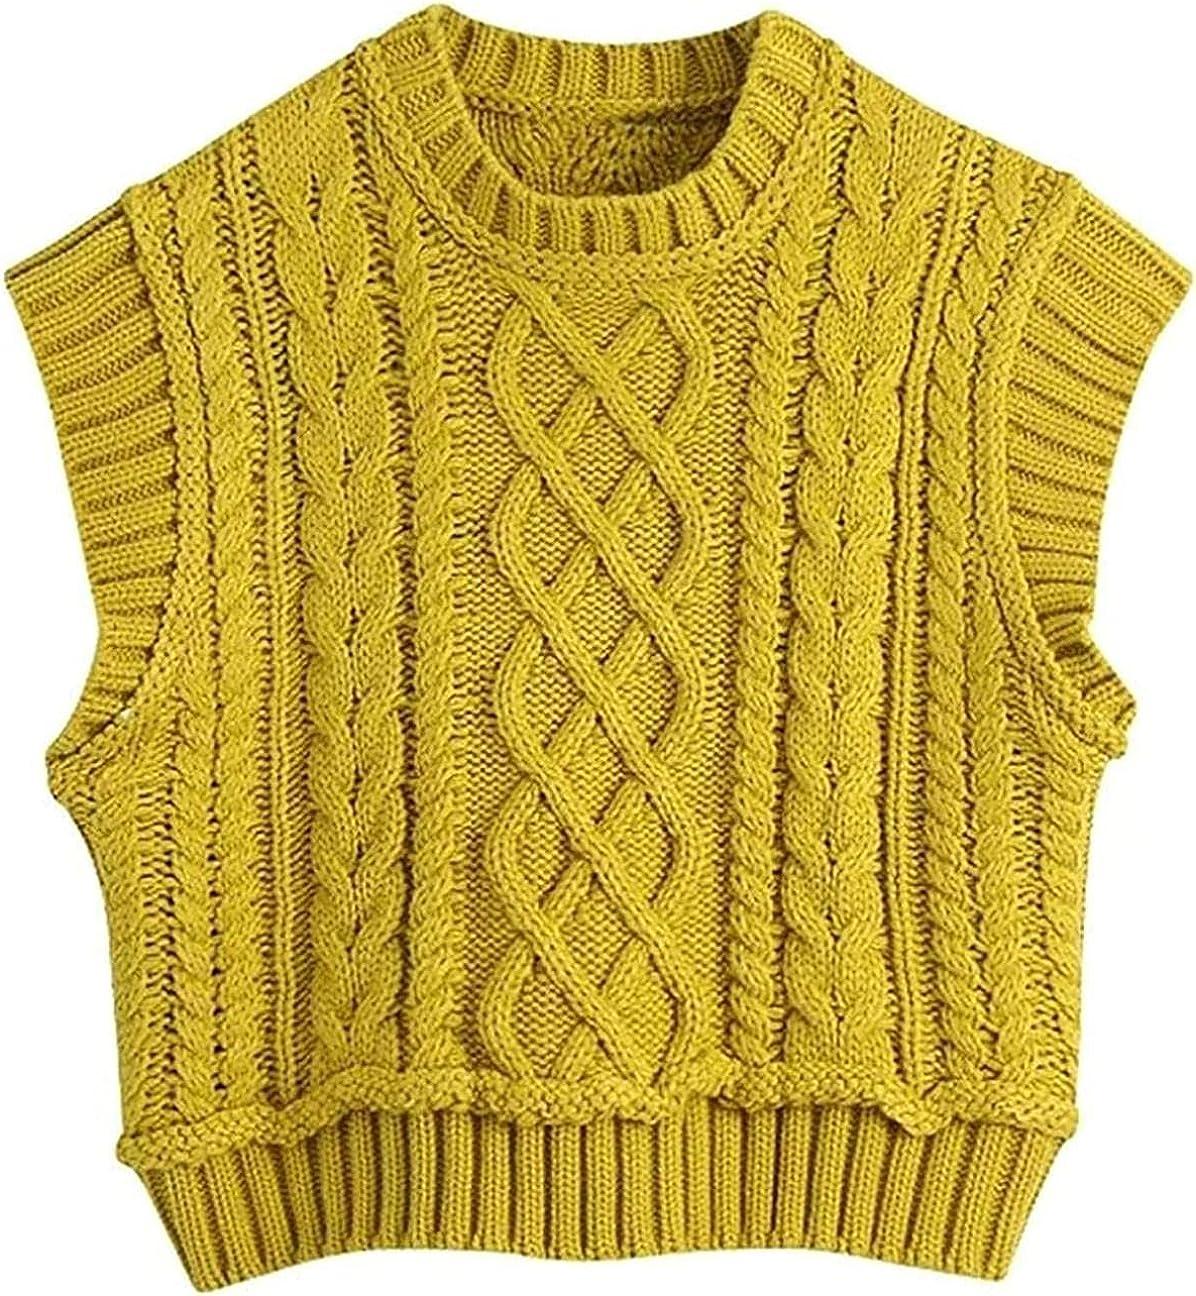 Women Fashion O Neck Solid Twist Sleevel Sweater Very popular Knitting Atlanta Mall Female